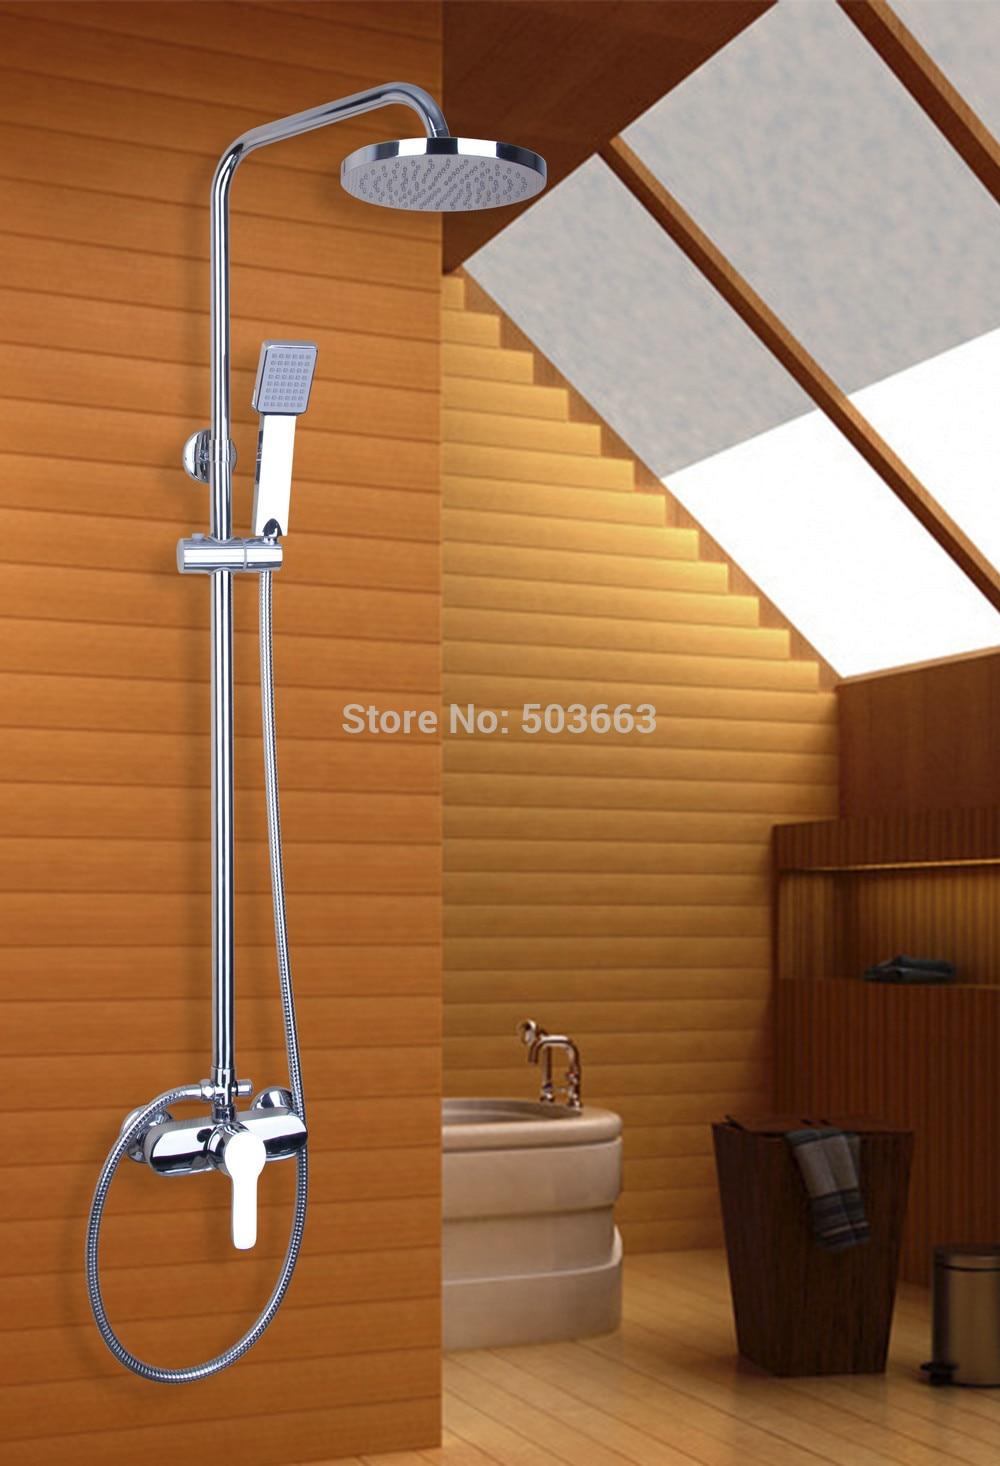 bathroom luxury shower set 53607 New 8\'\'Wall Mounted Round Tub ...